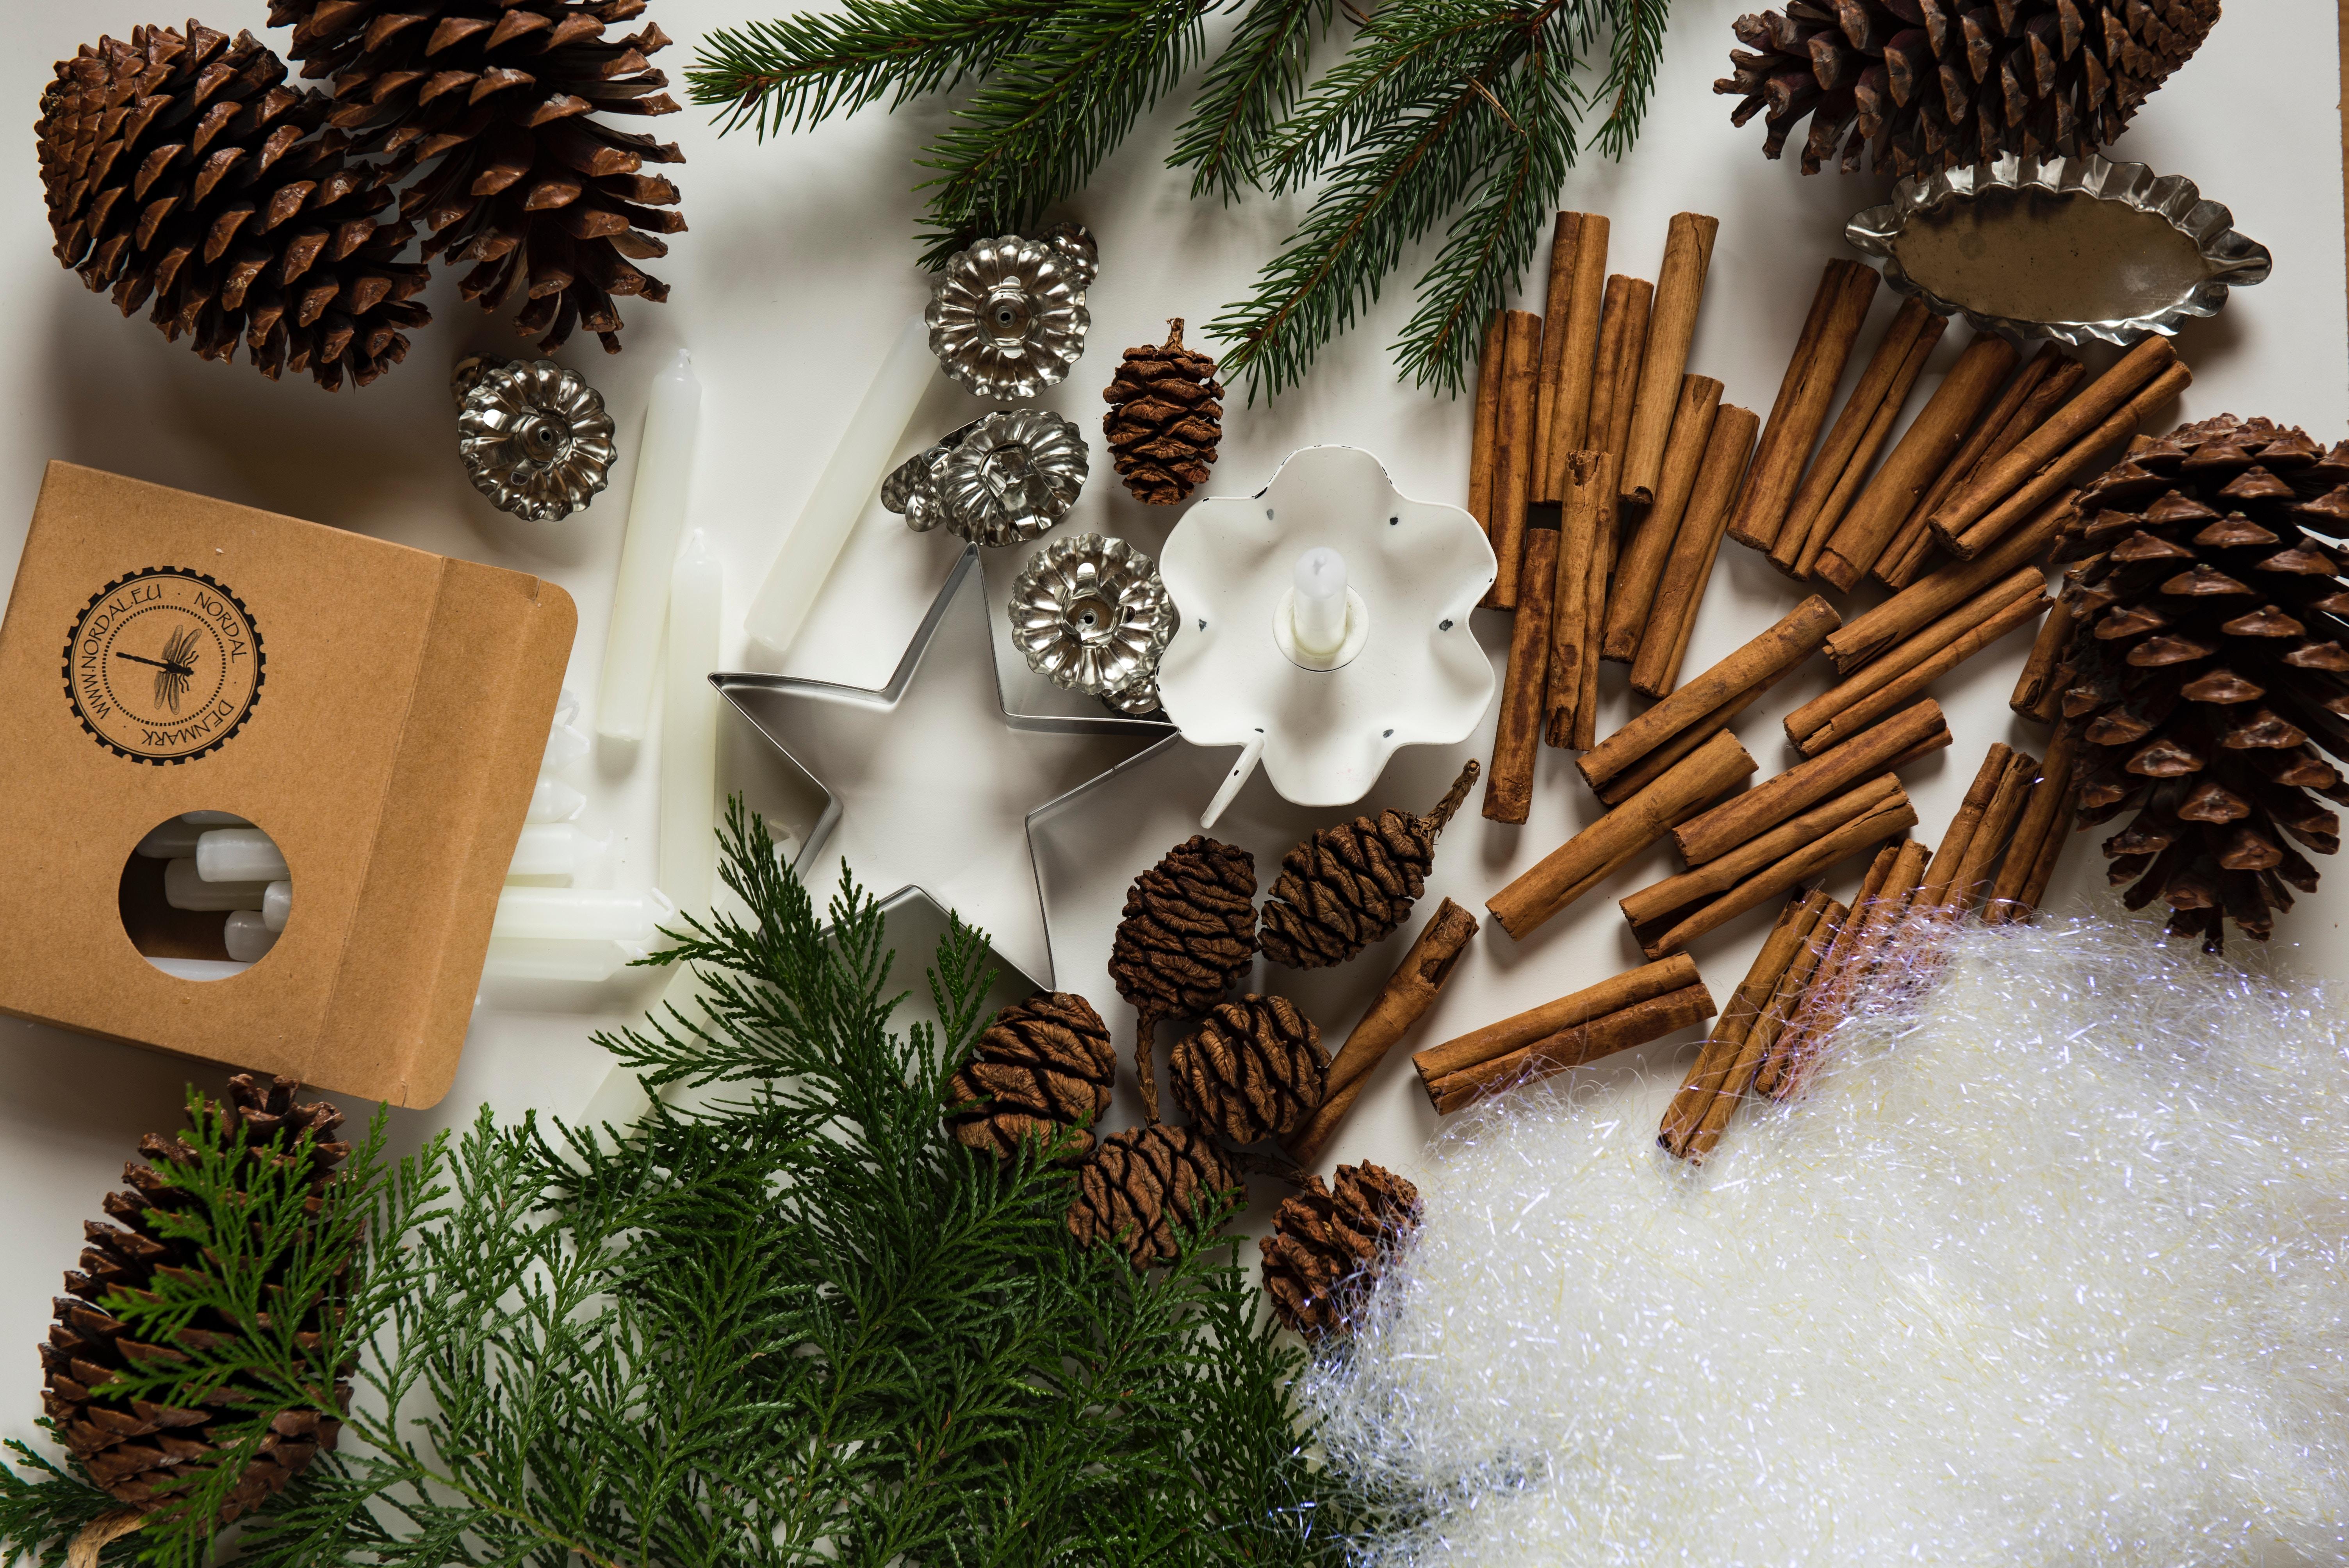 Dec 2018 Meeting: Christmas Crafts